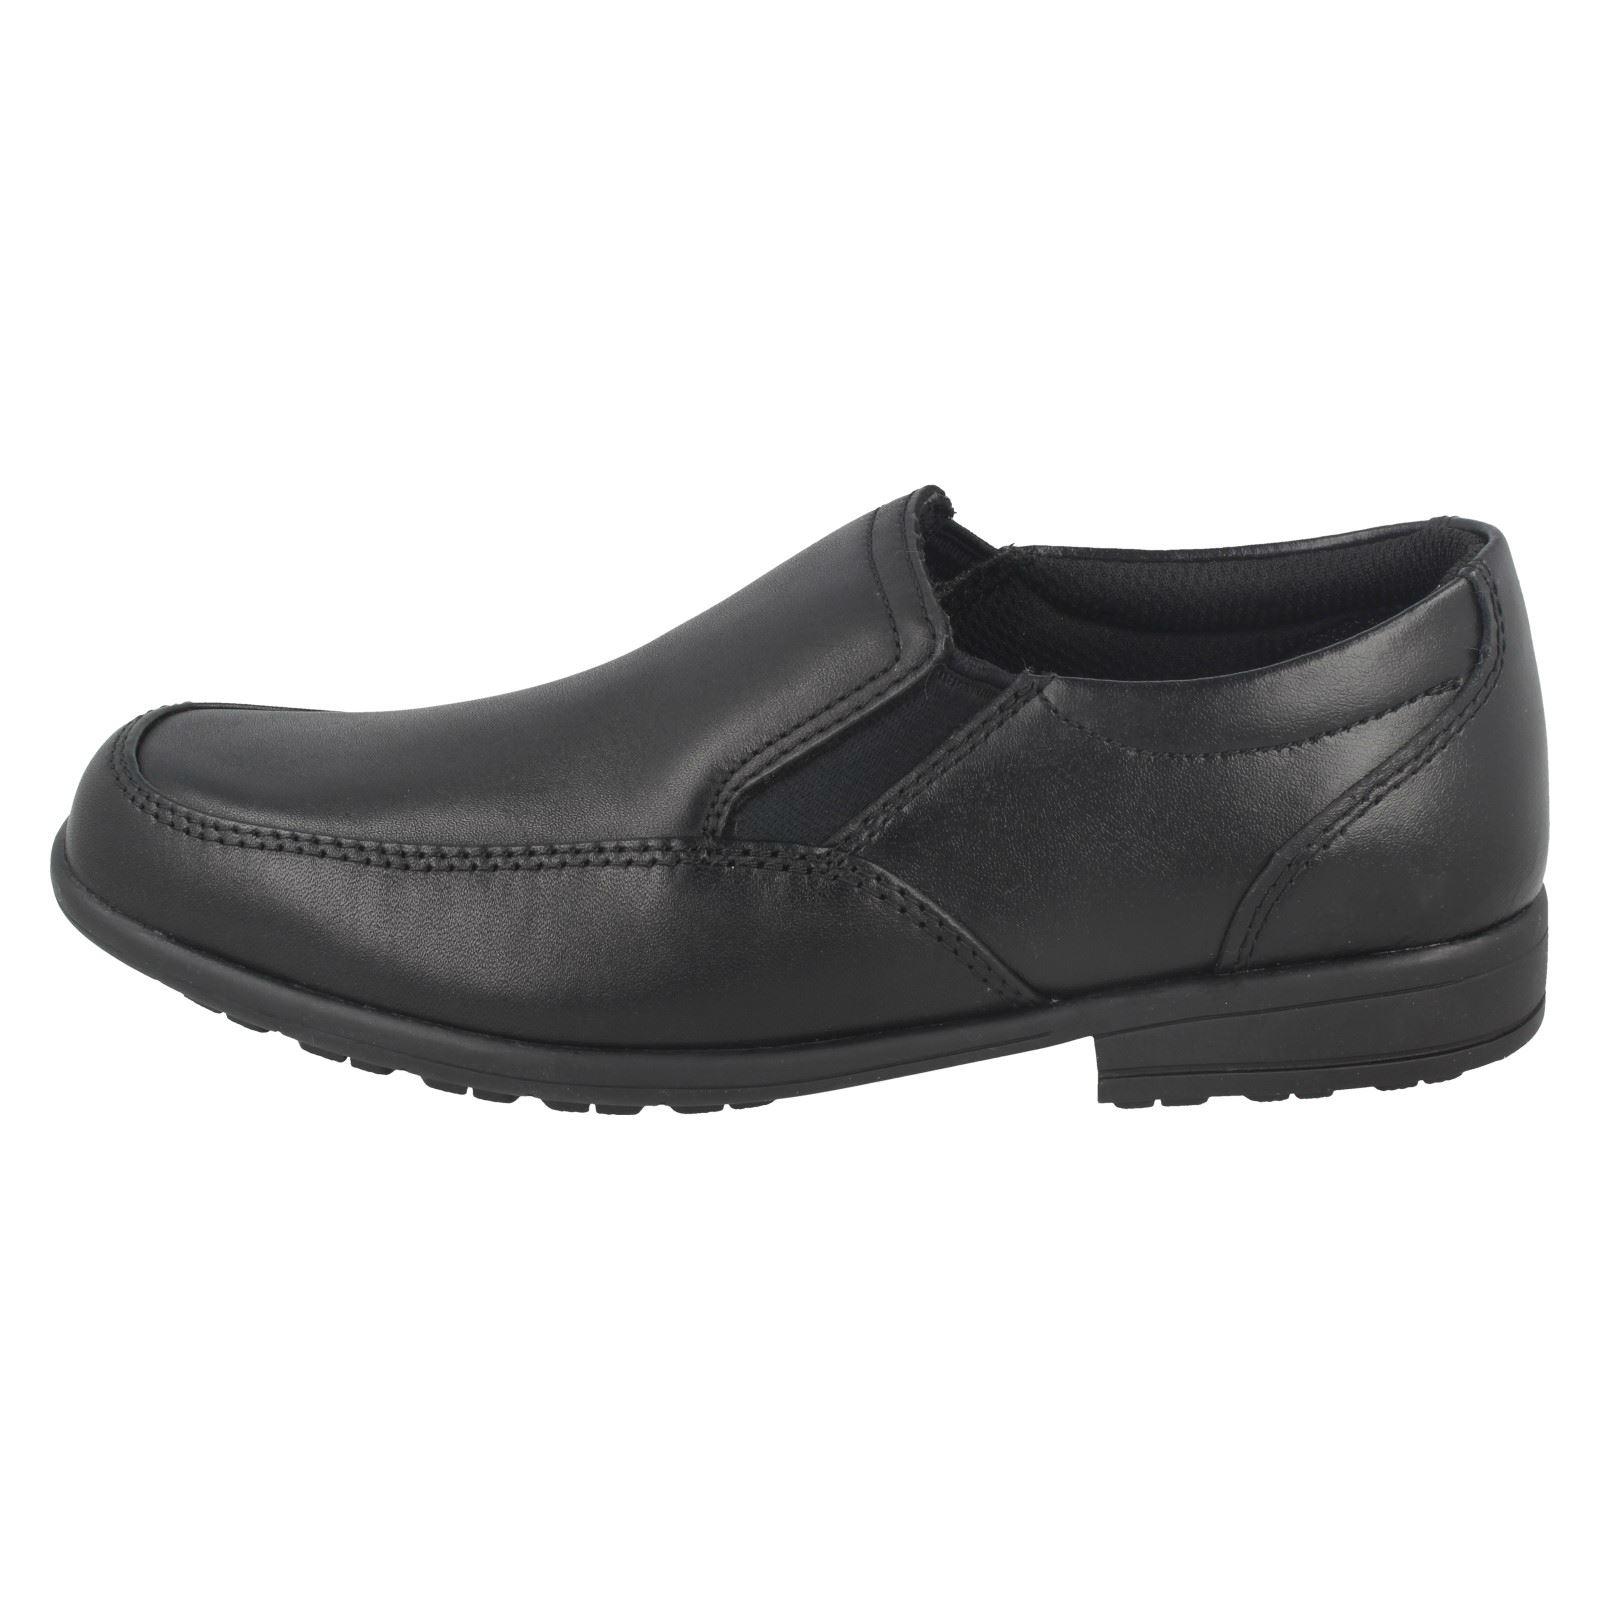 garcons-CLARKS-MOCASSINS-STYLE-Chaussures-d-039-ecole-